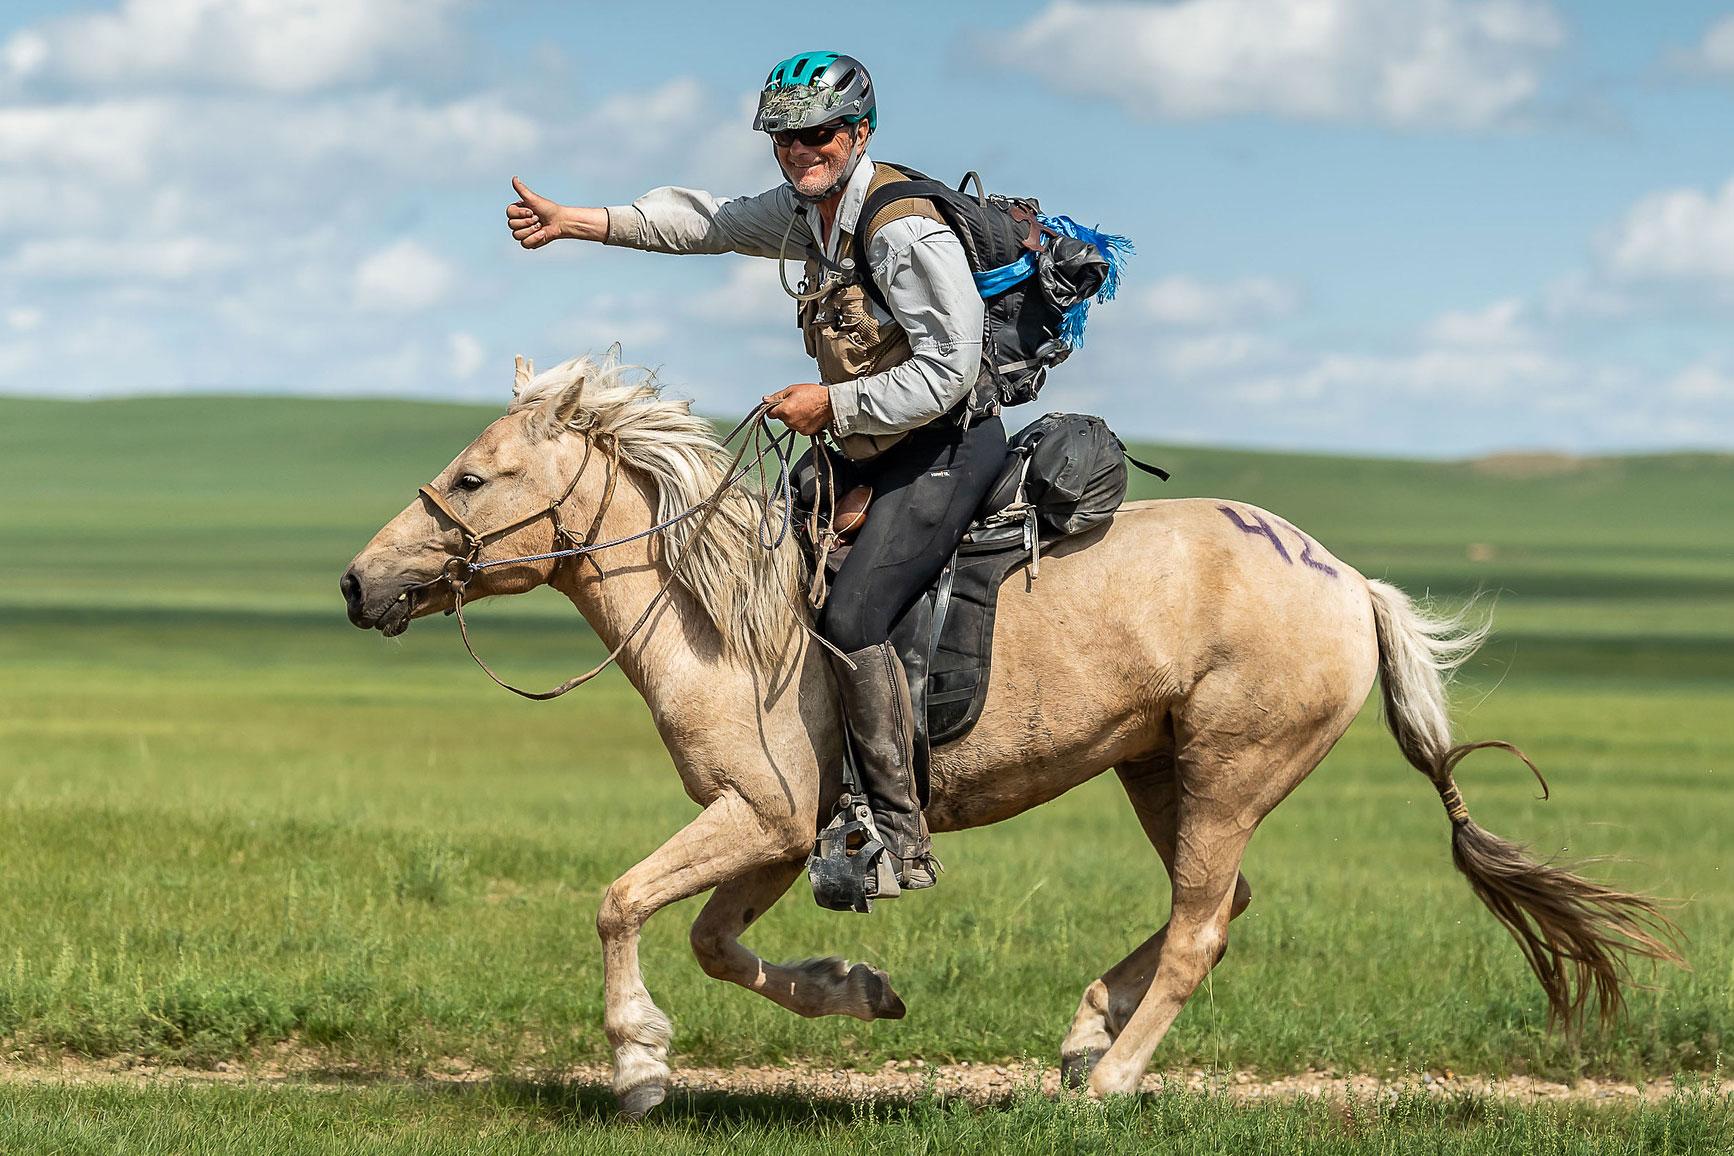 Bob Long wins Mongol Derby